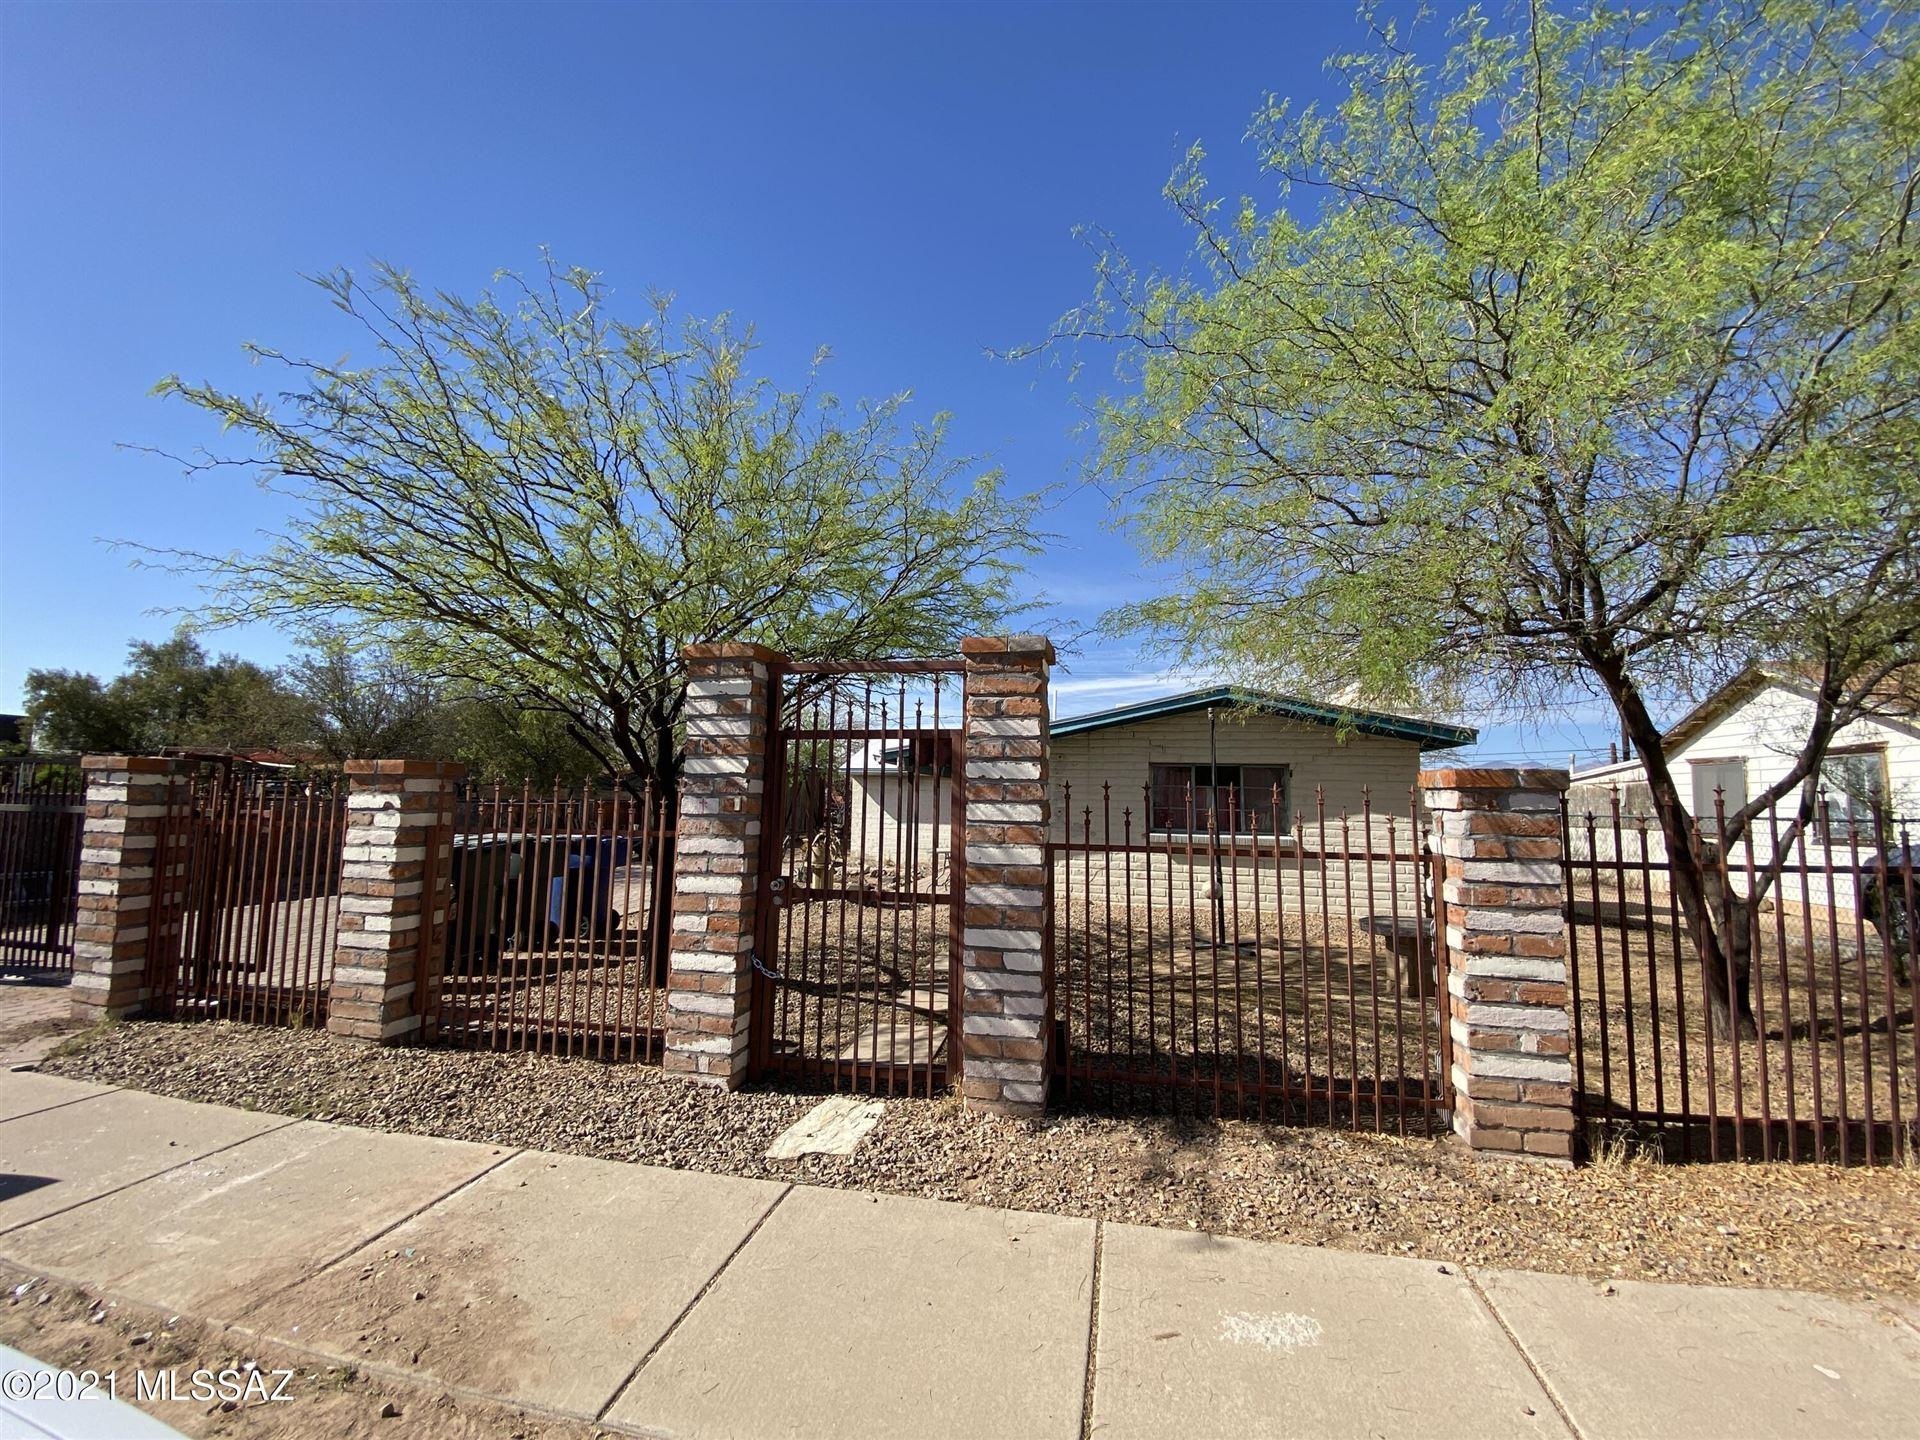 818 W Nevada Street, Tucson, AZ 85706 - MLS#: 22109358